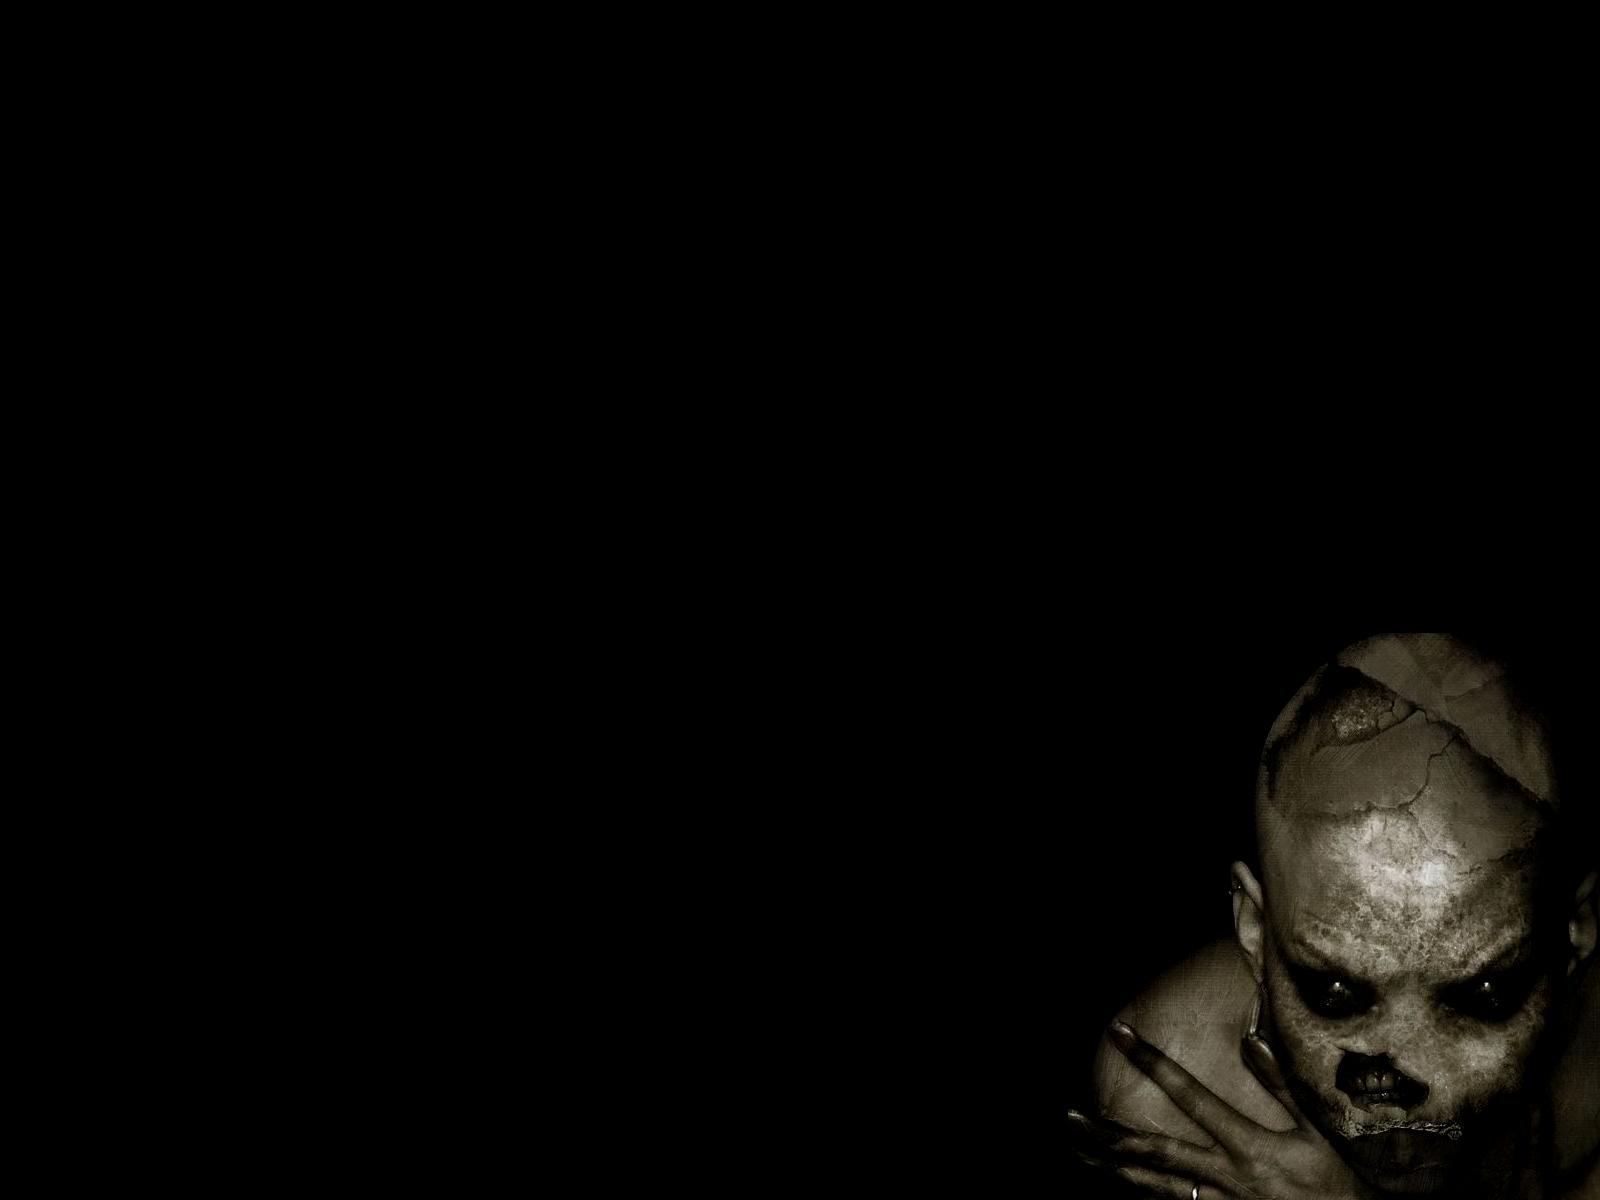 HD Wallpaper   Background ID:1644. 1600x1200 Dark Scary